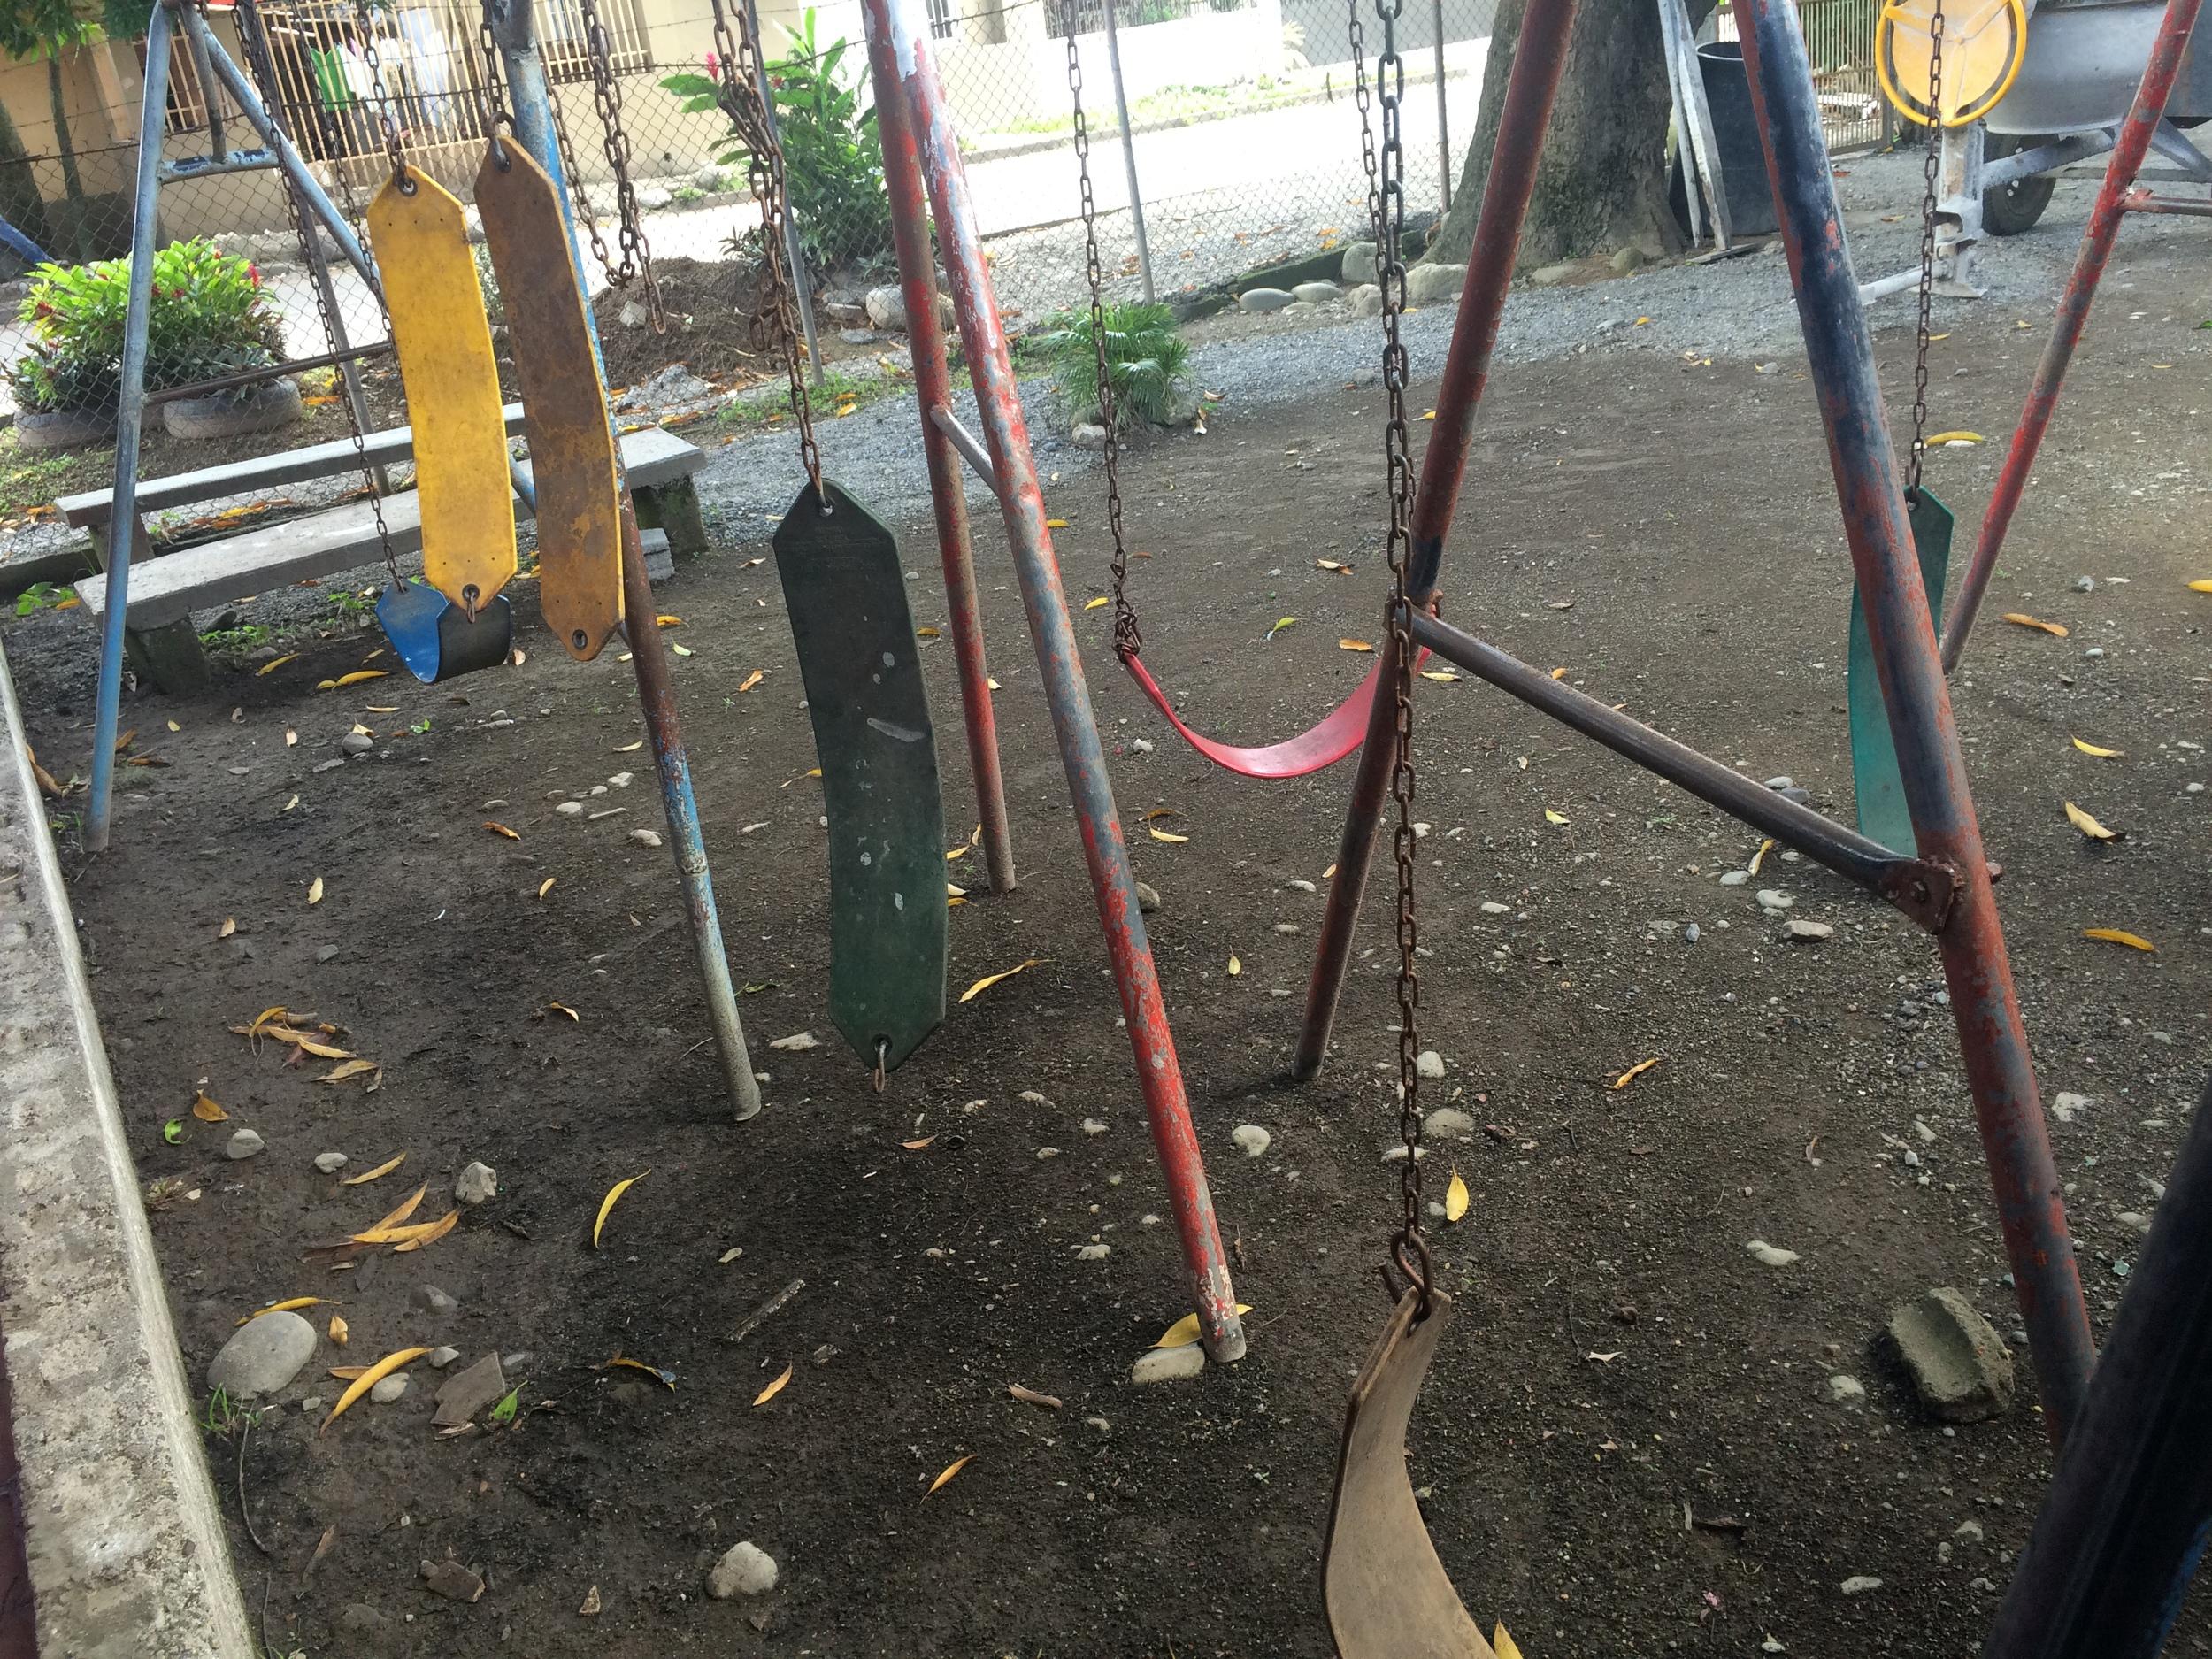 Connect Global Dinaf Visit Playground